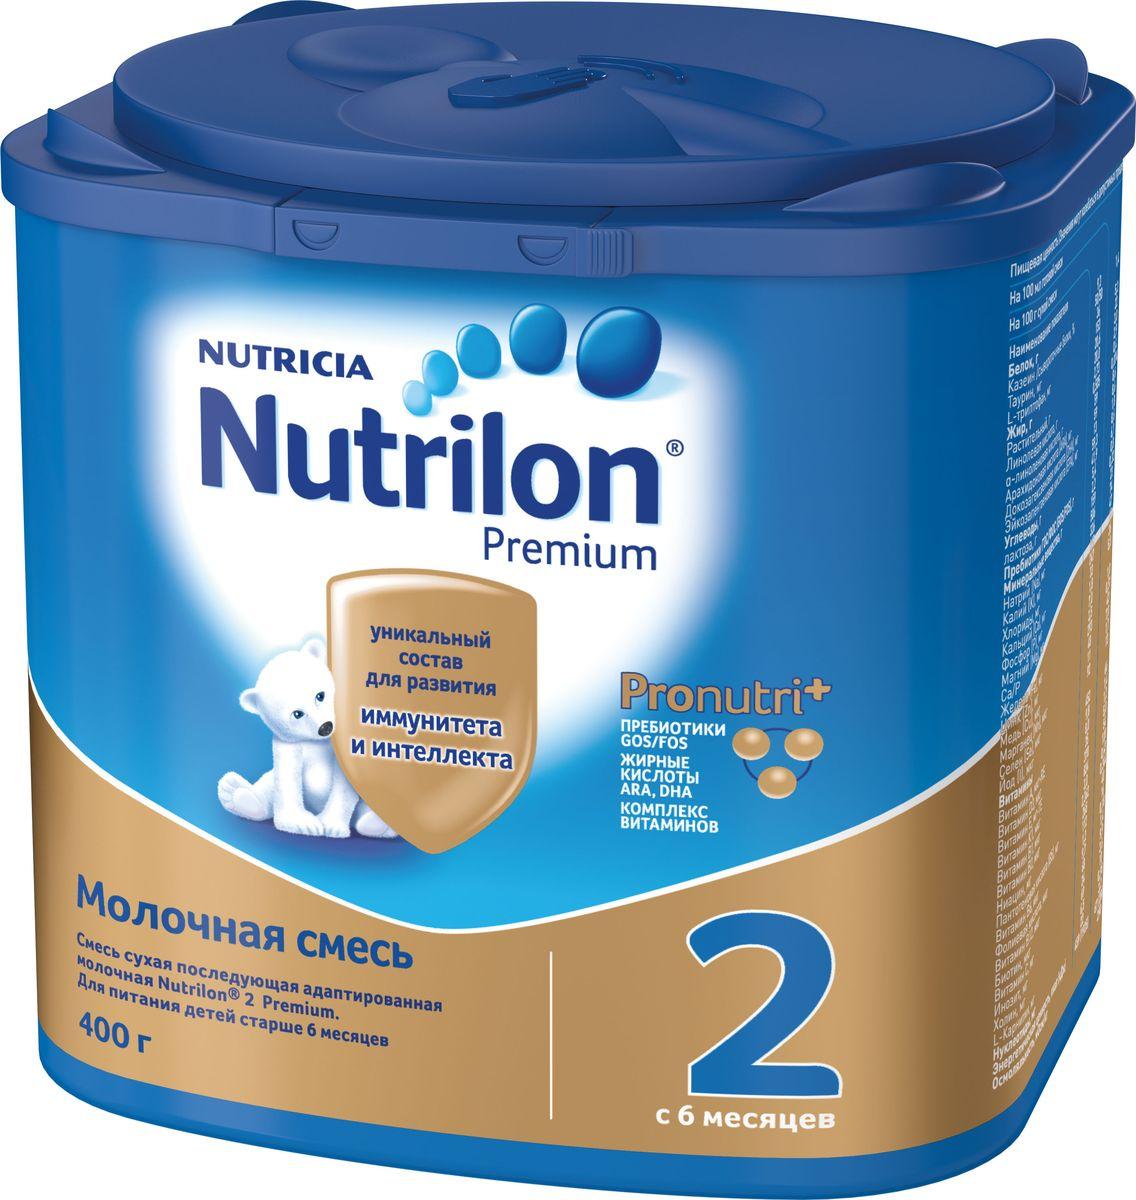 Nutrilon Премиум 2 молочная смесь PronutriPlus, с 6 месяцев, 400 г nutrilon премиум 2 молочная смесь pronutriplus с 6 месяцев 400 г